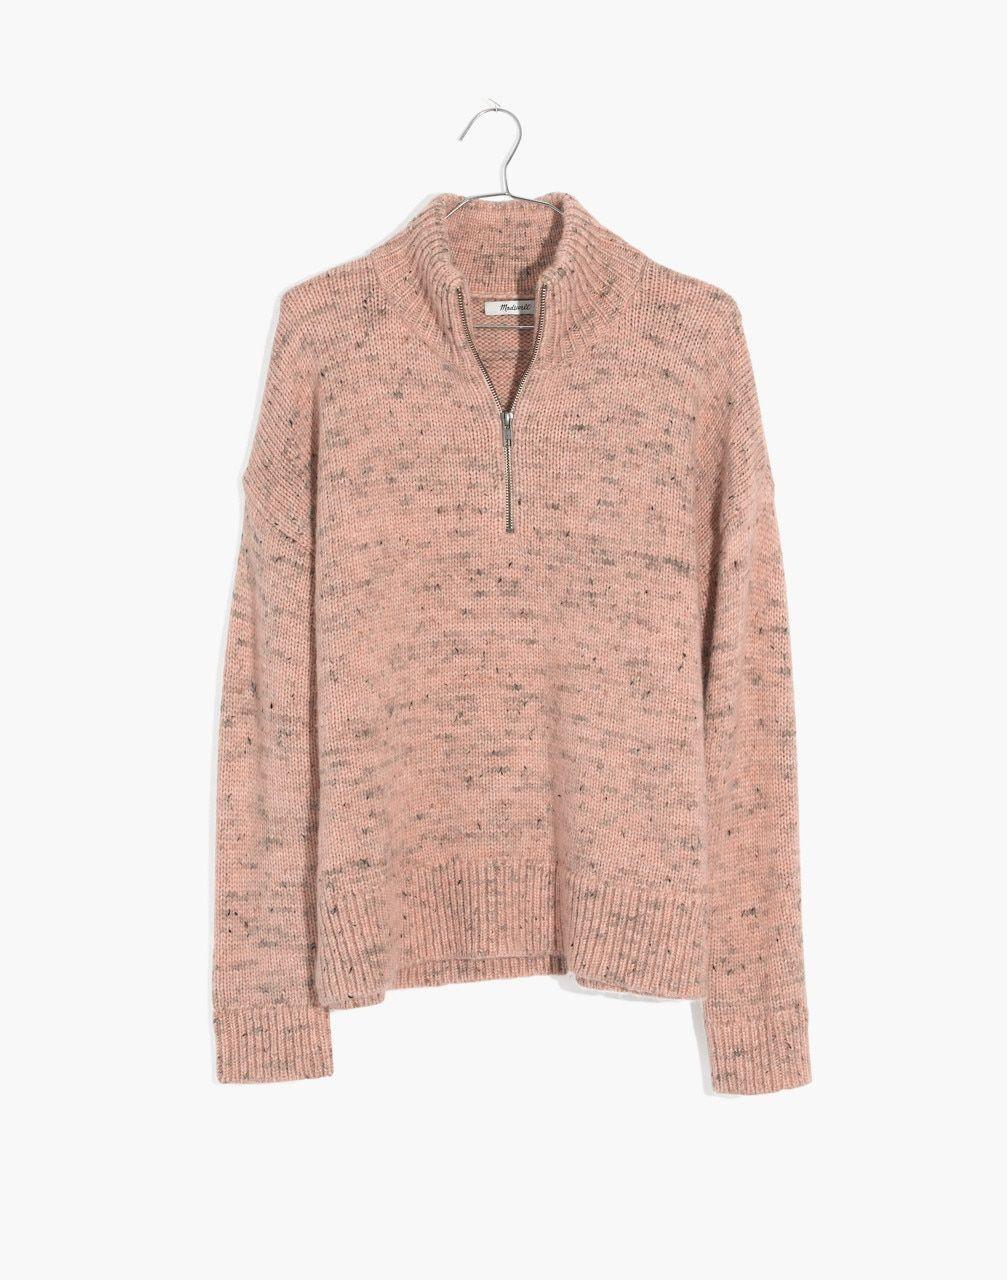 4e268c1d71c3 Half-Zip Popover Sweater in donegal blush image 4